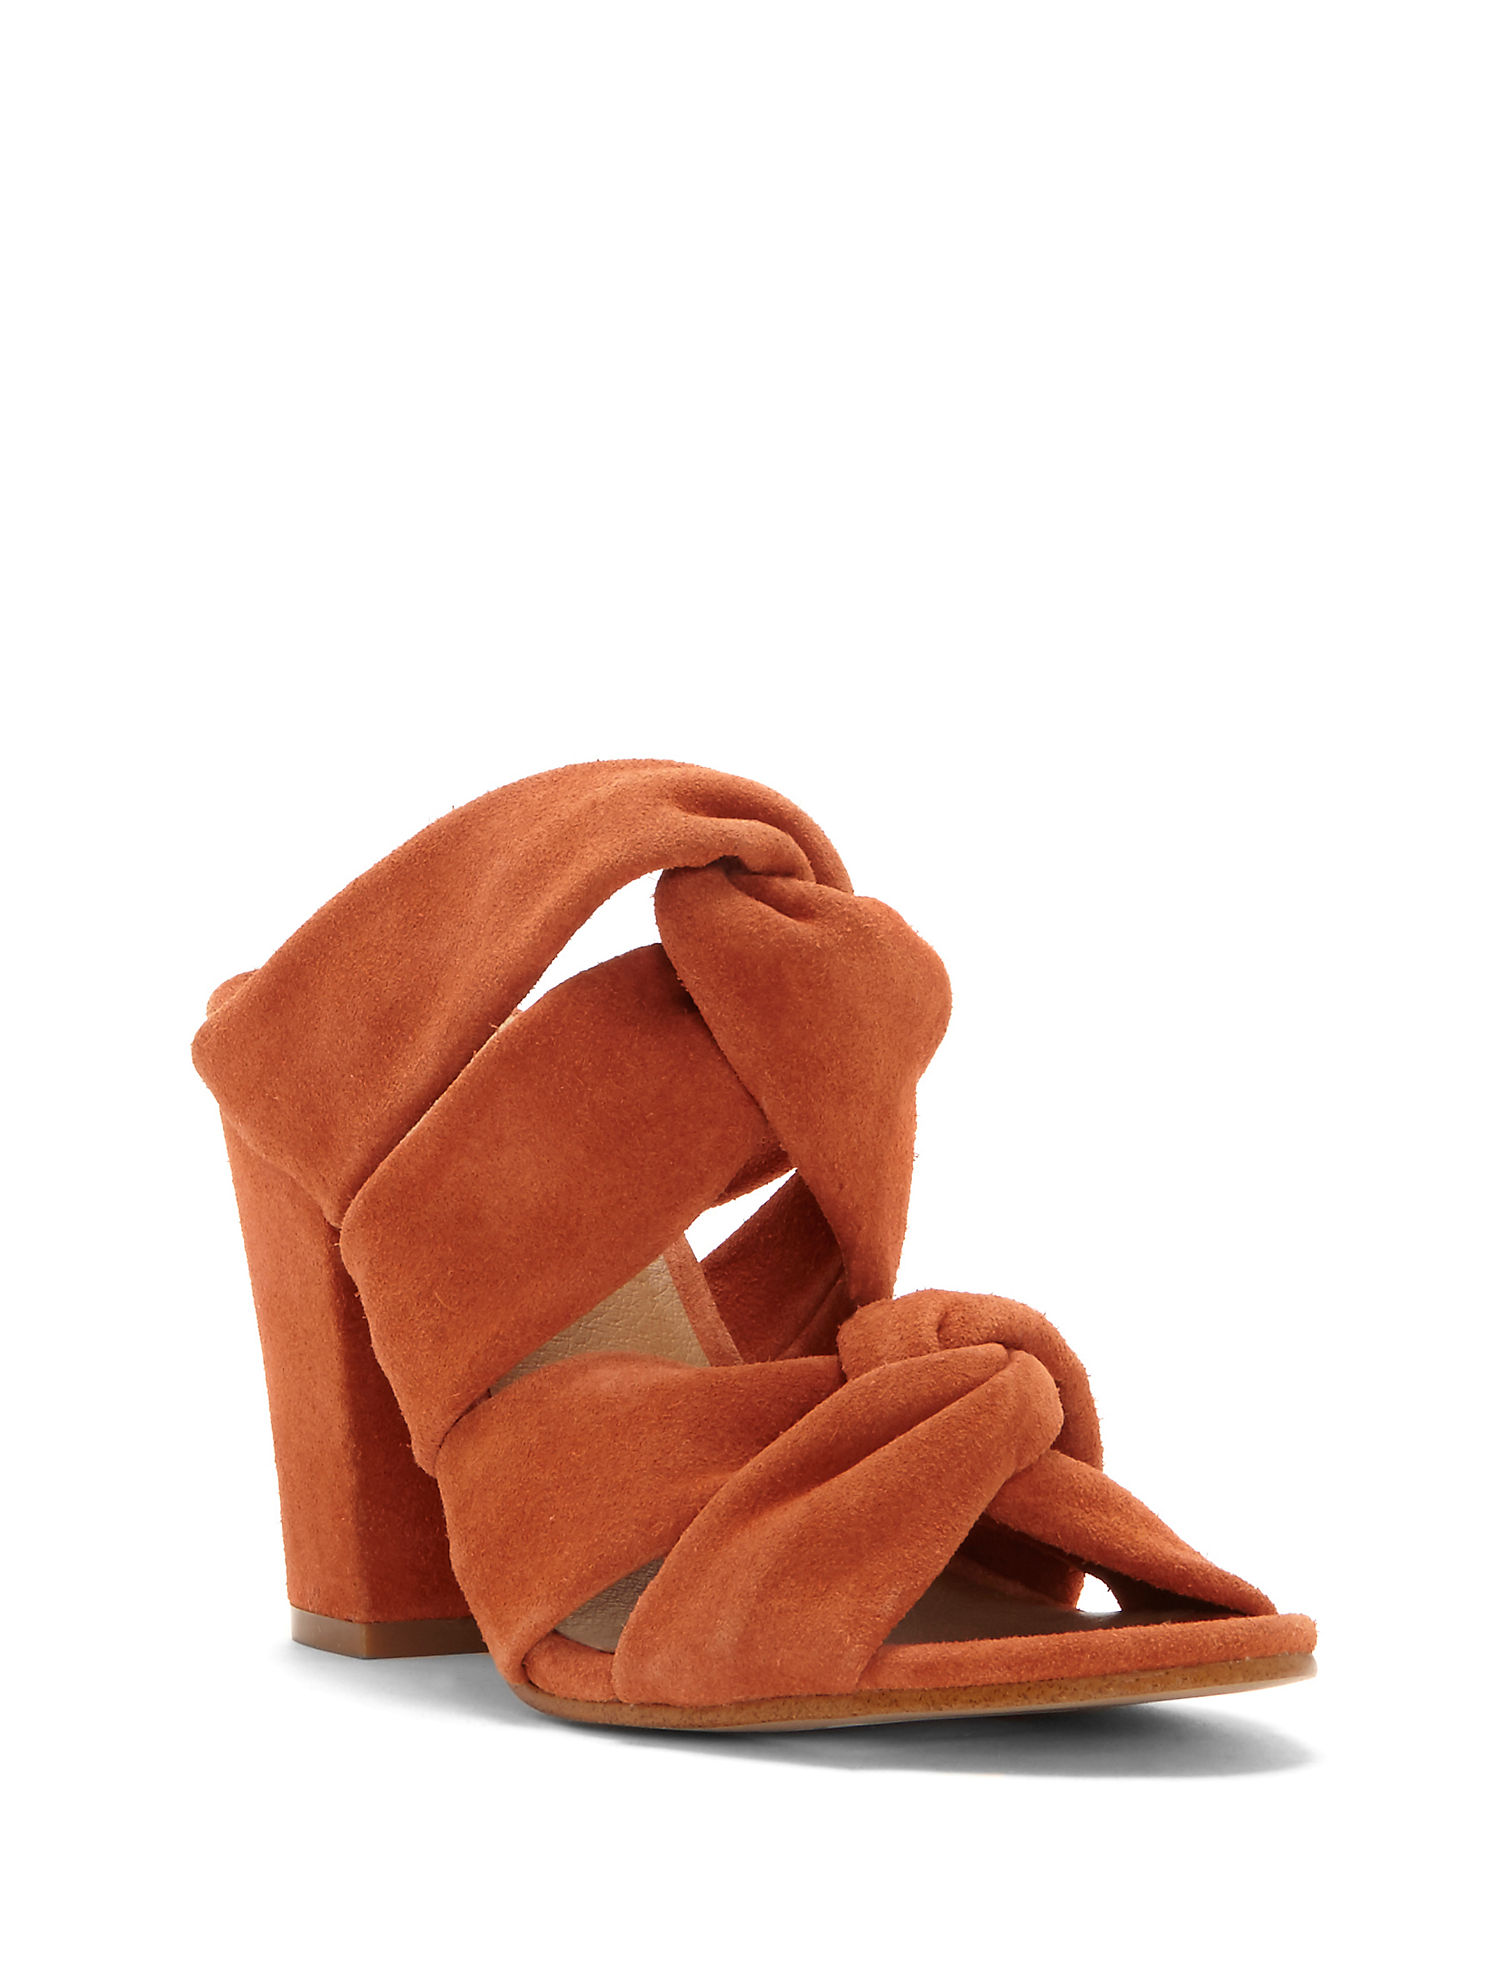 Nine West 25022886 Womens Jay Leather Wedge Sandal- Choose SZ/Color.